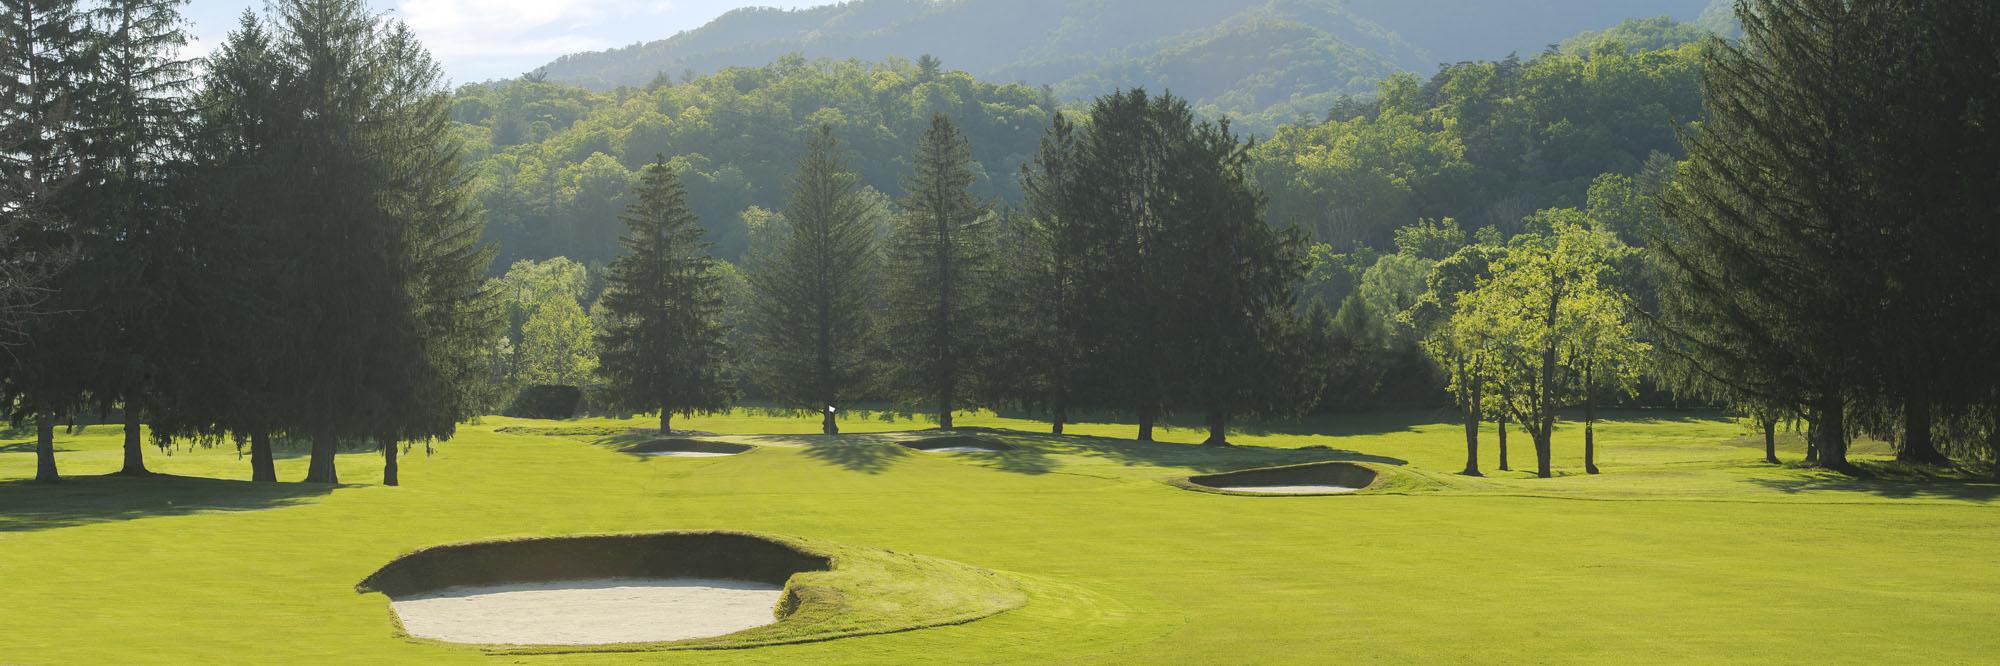 Golf Course Image - The Greenbrier Meadows Course No. 7